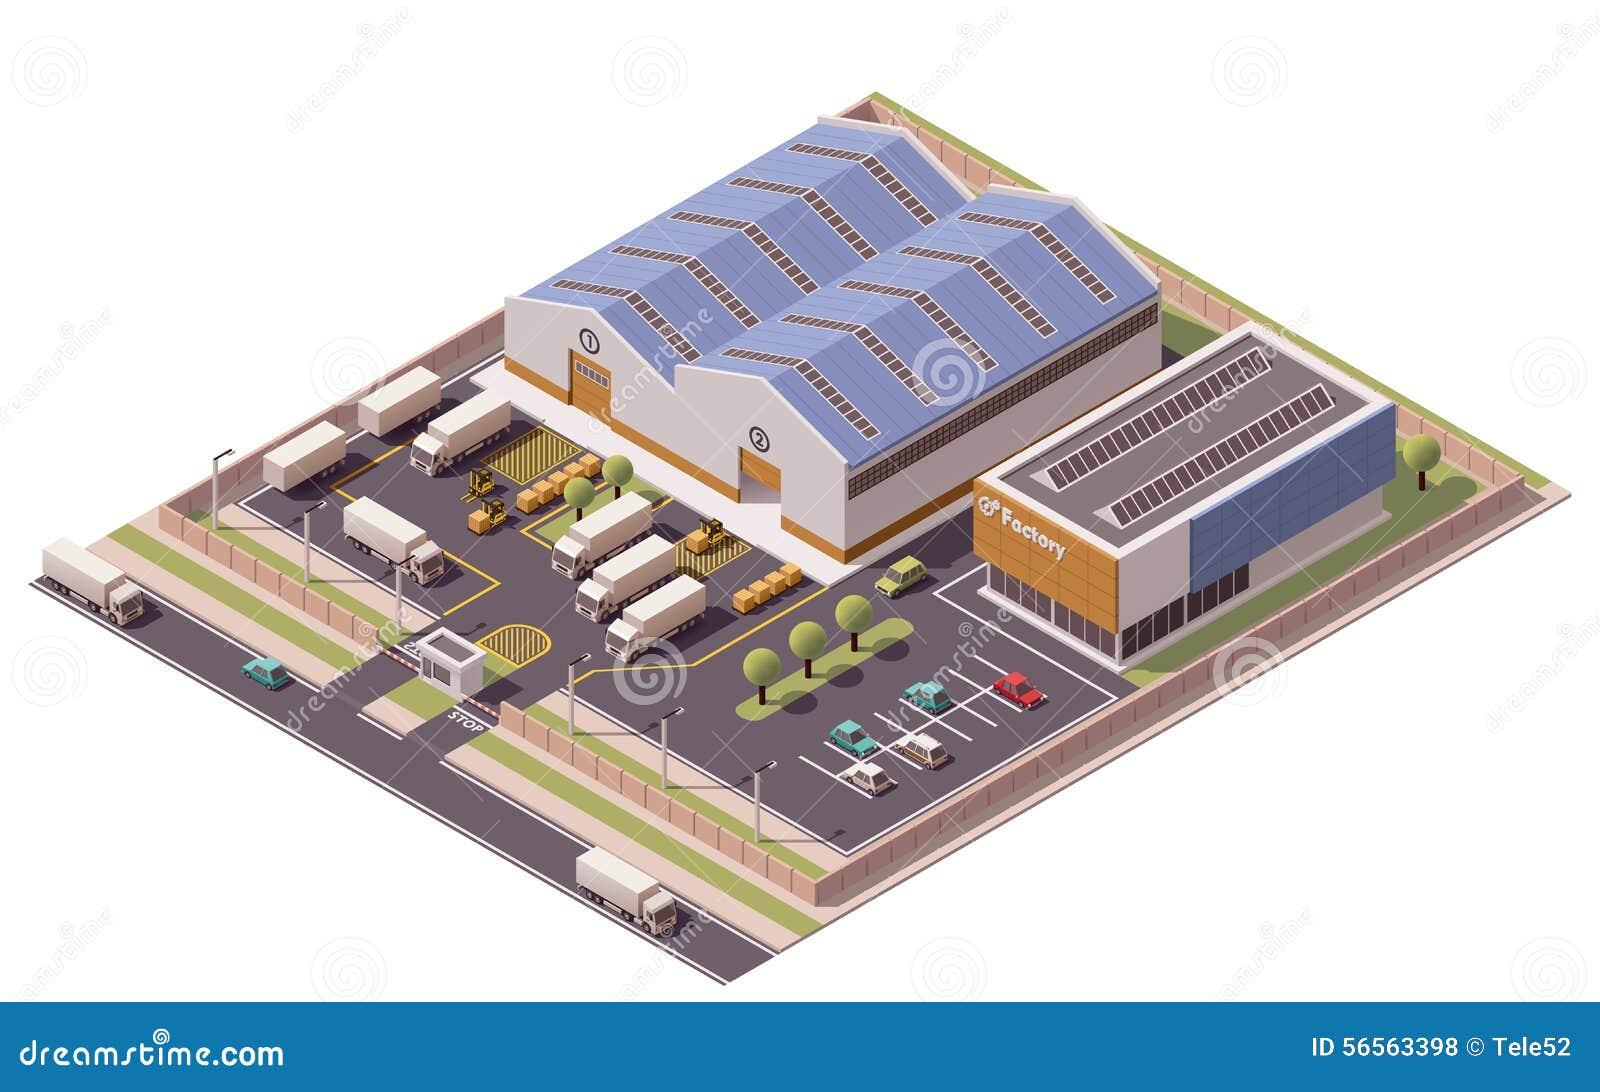 Download Διανυσματικό Isometric εικονίδιο κτηρίων εργοστασίων Διανυσματική απεικόνιση - εικονογραφία από γραφείο, εικονόγραμμα: 56563398